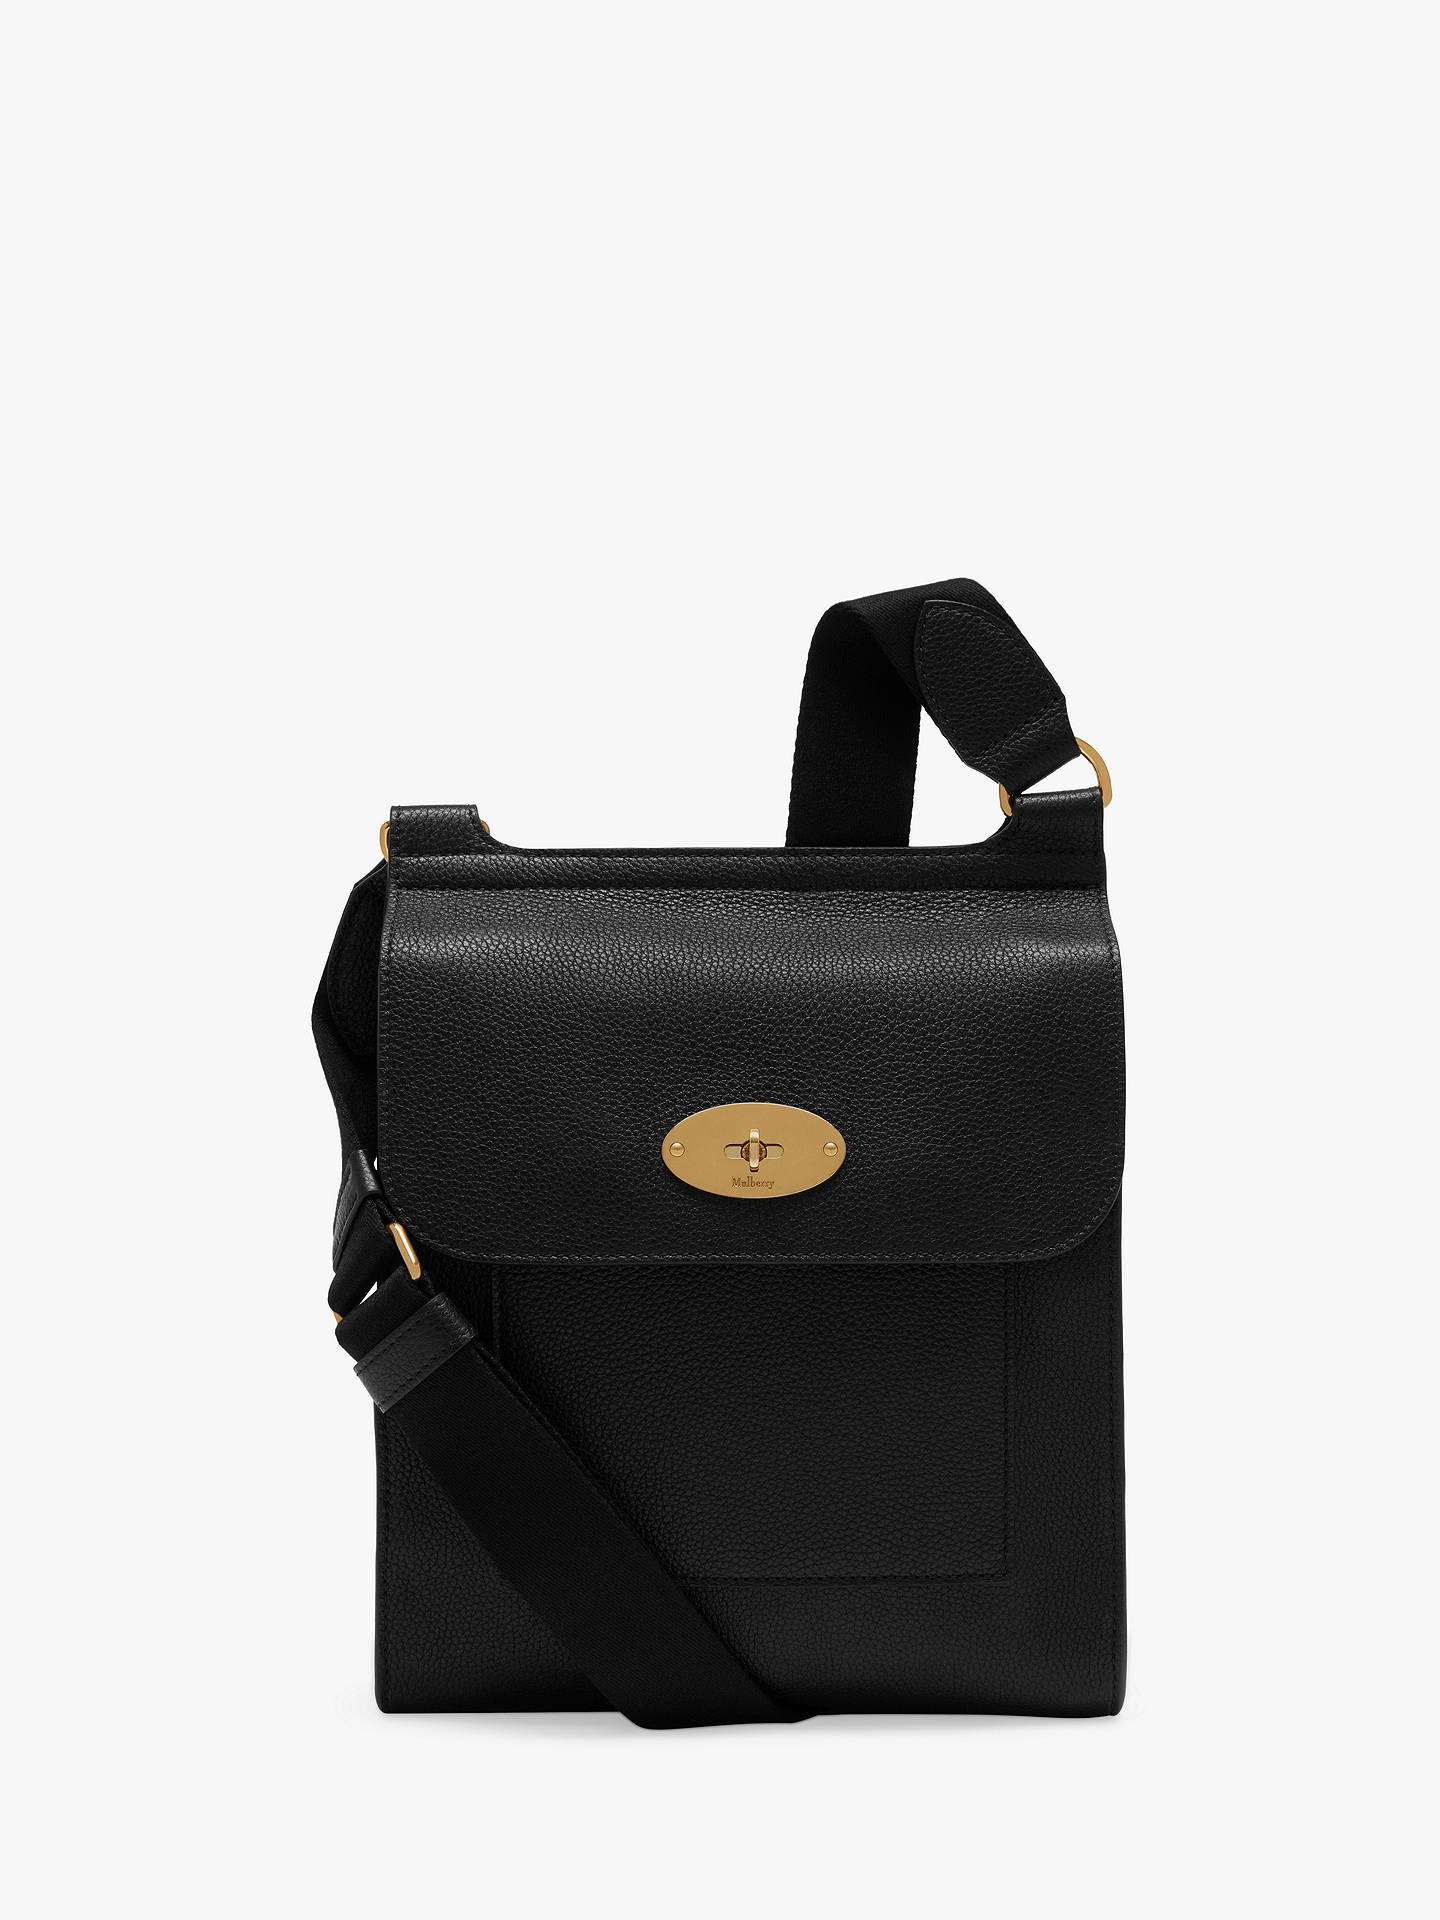 633d221de2d Buy Mulberry New Antony Small Classic Grain Leather Satchel, Black Online  at johnlewis.com ...